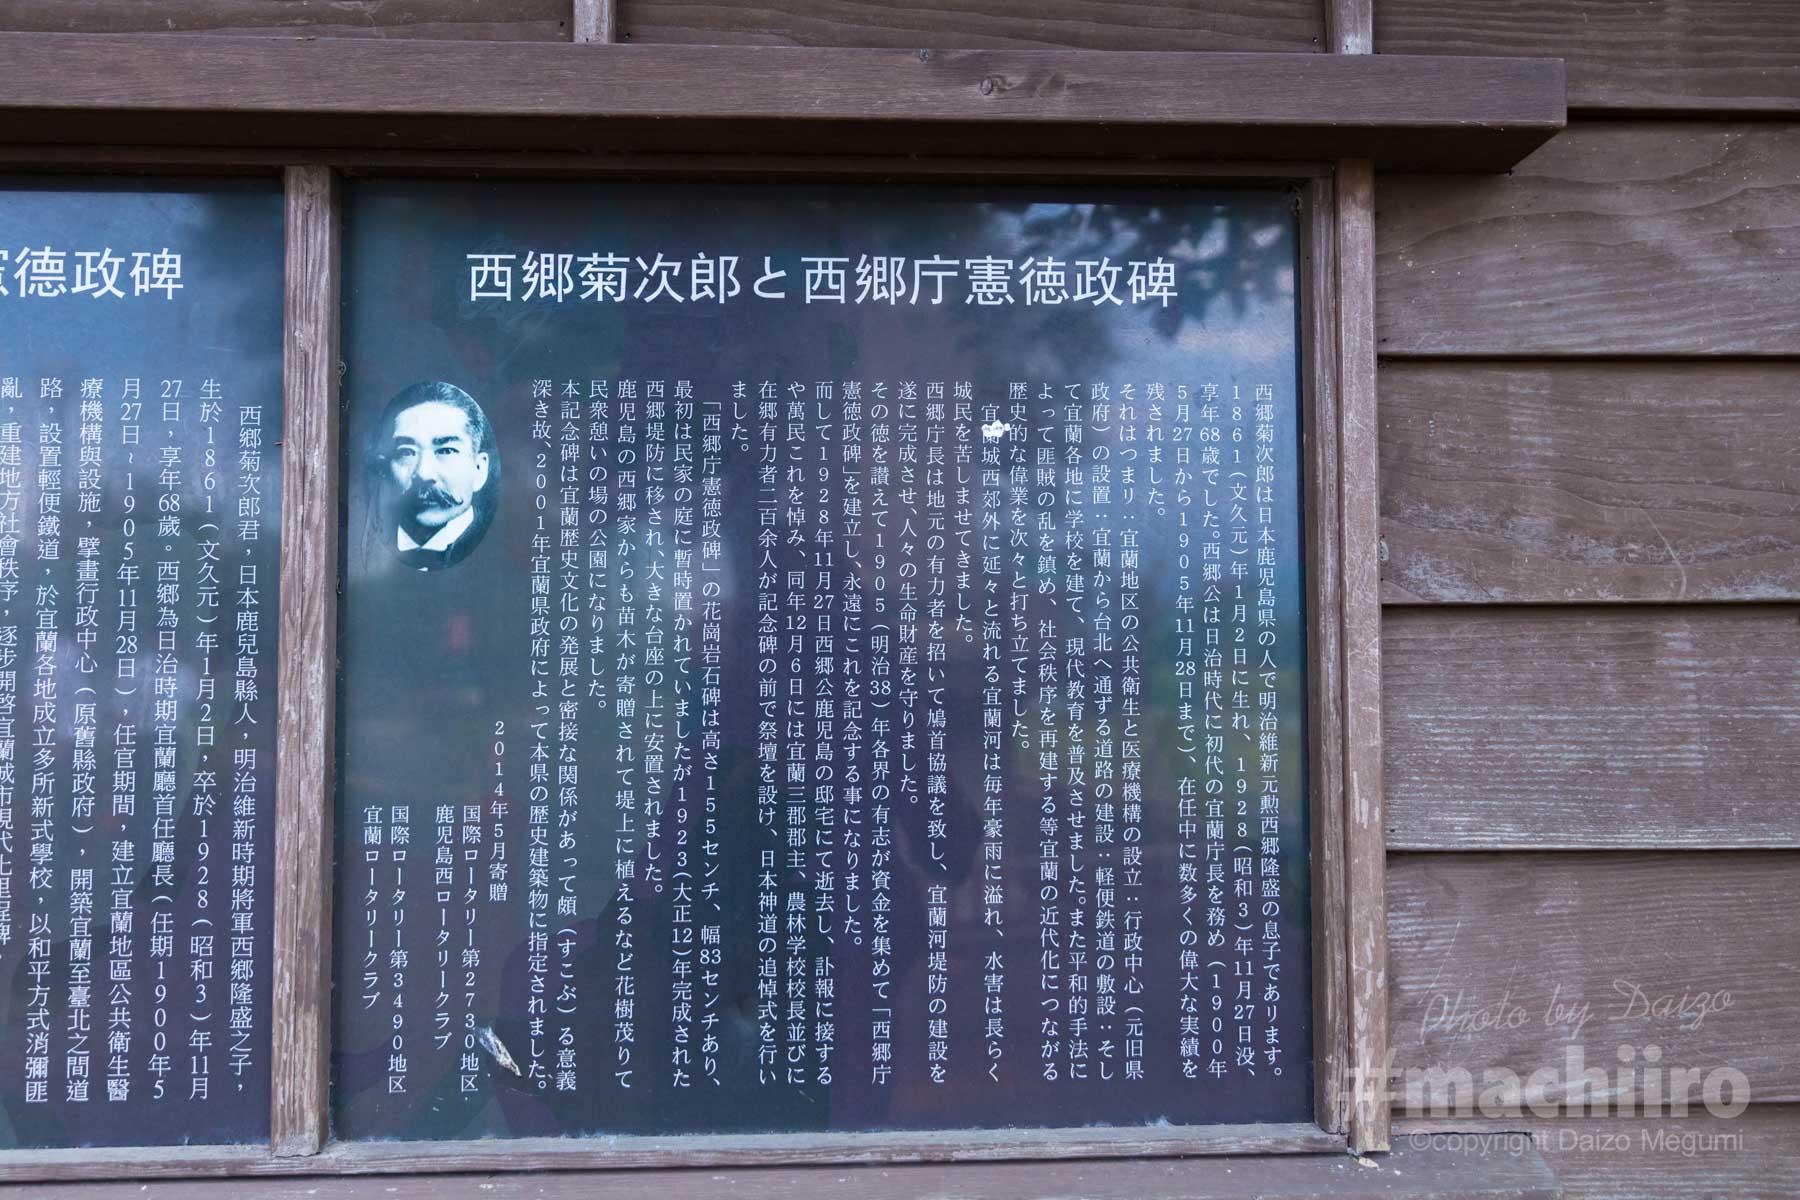 machiiro 撮影 説明看板の写真